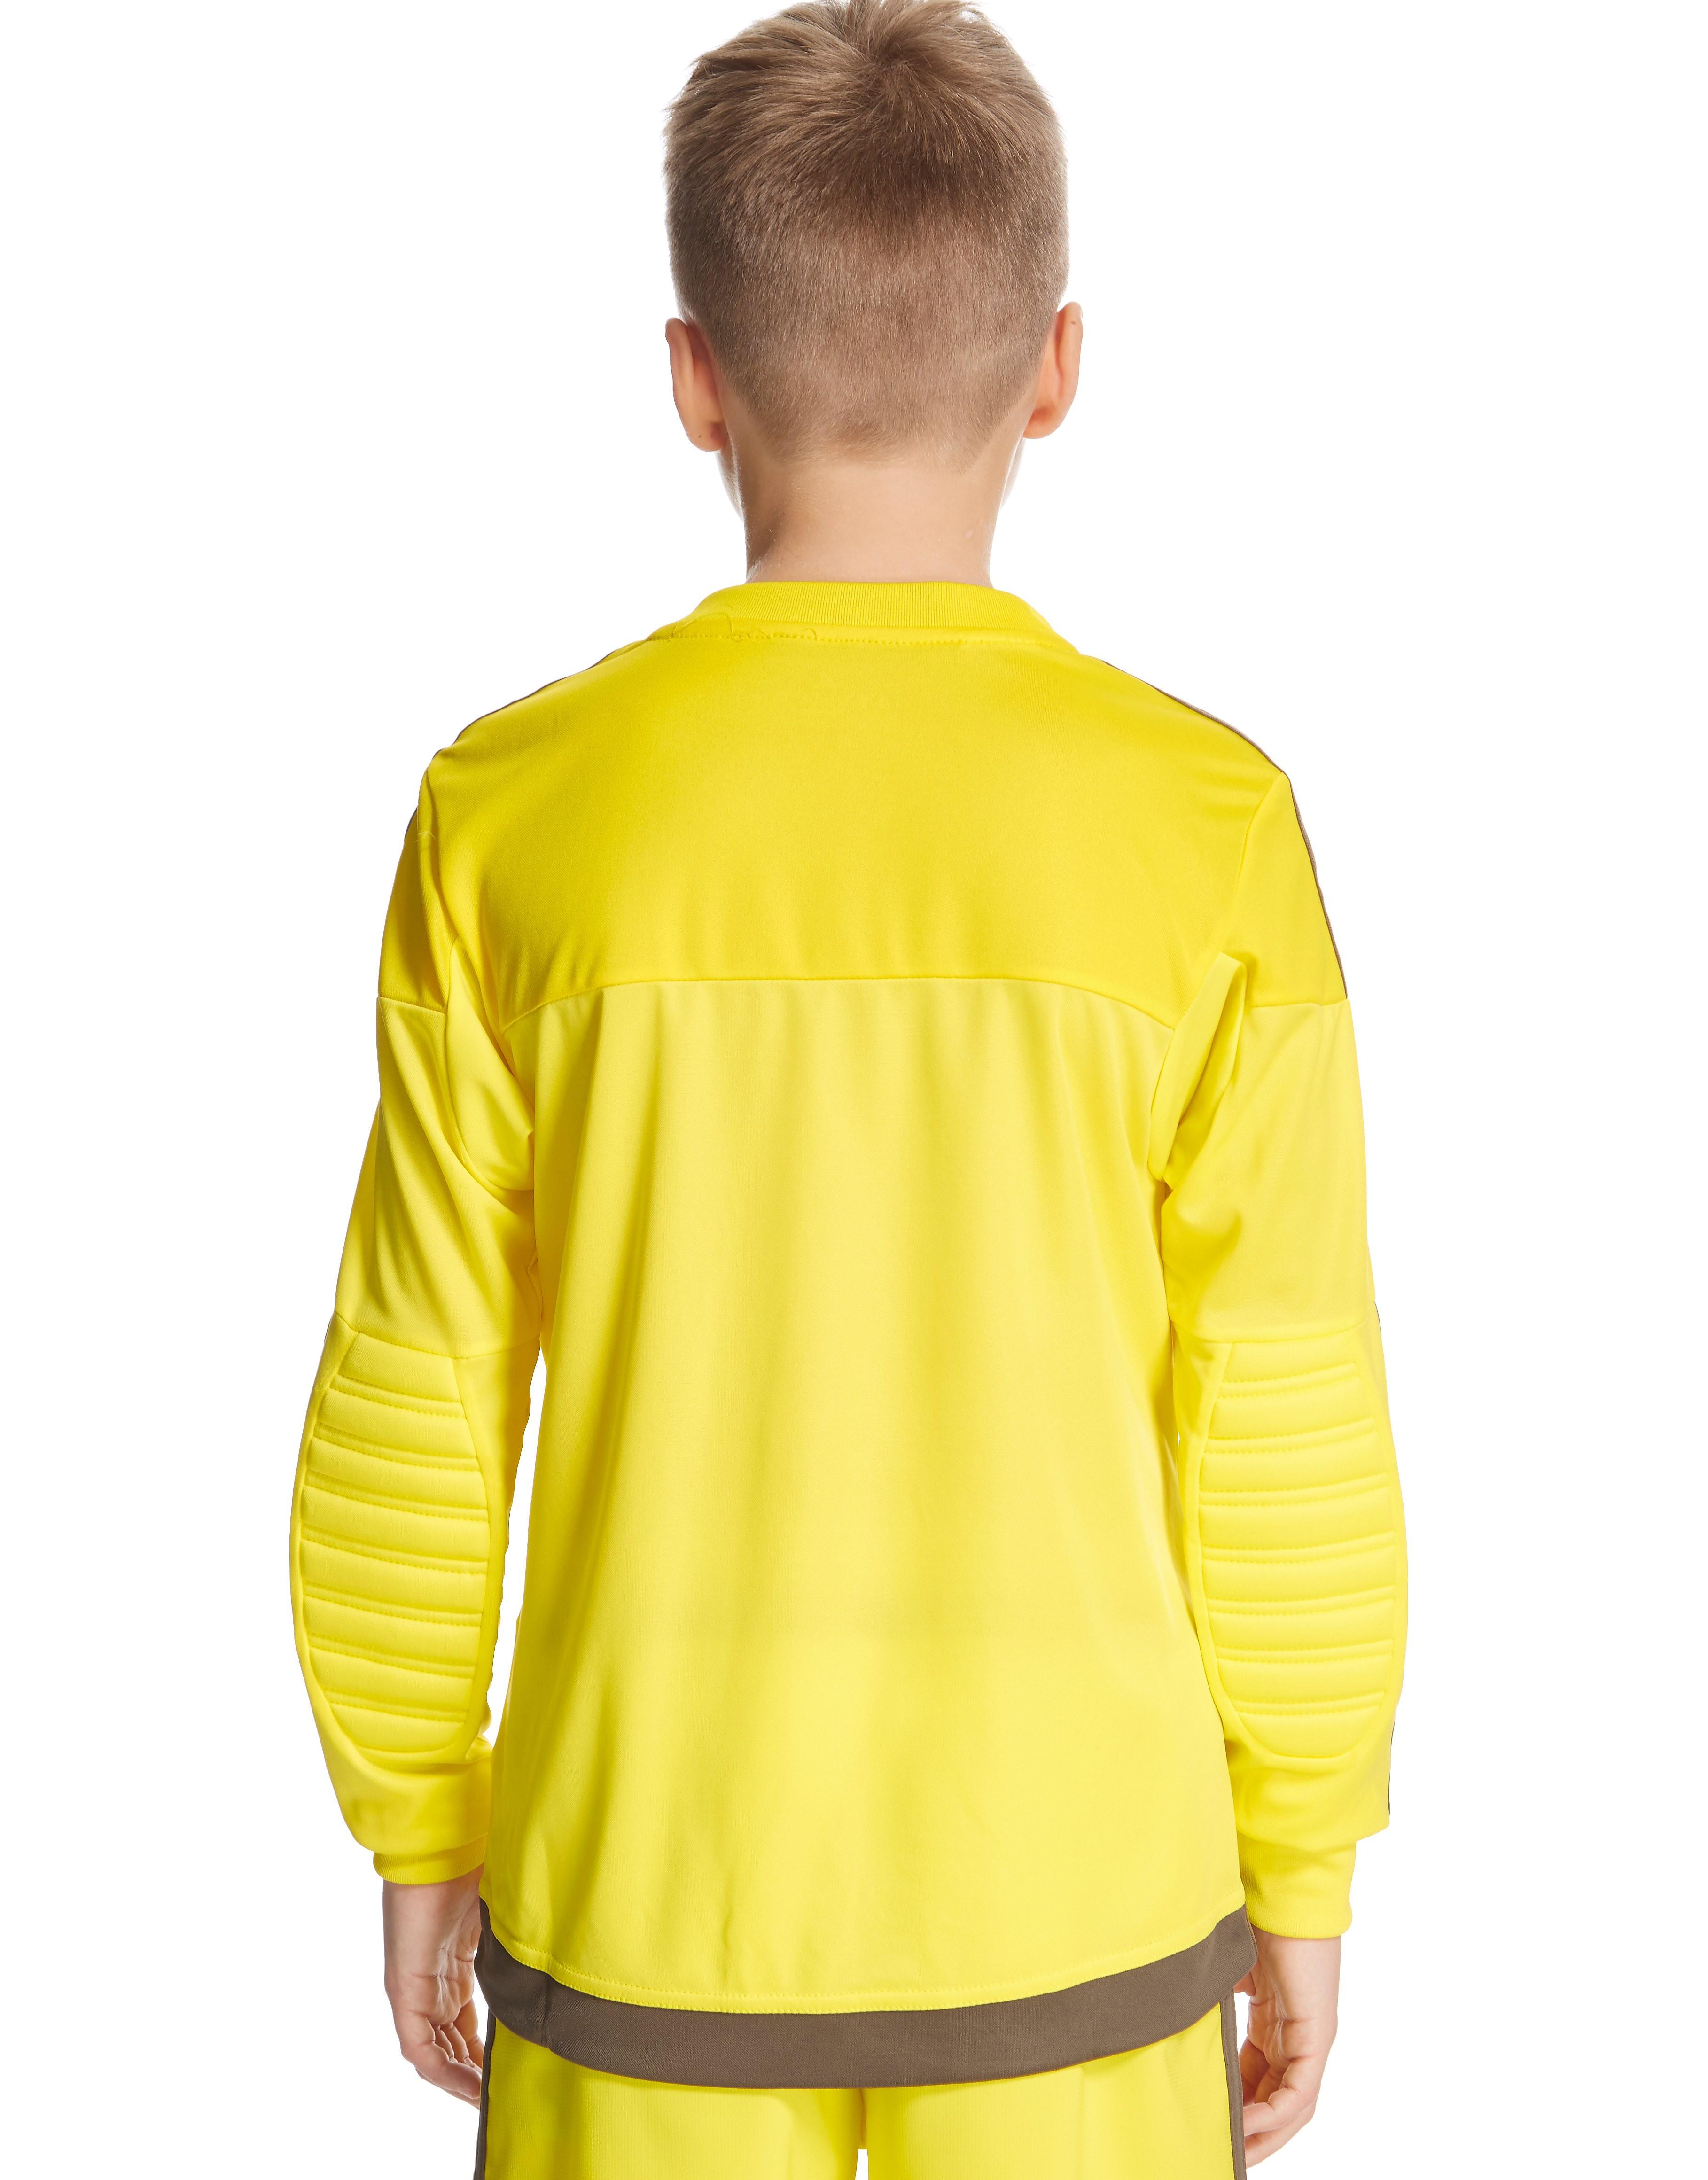 adidas FA Wales Home 2016 Goalkeeper Shirt Junior